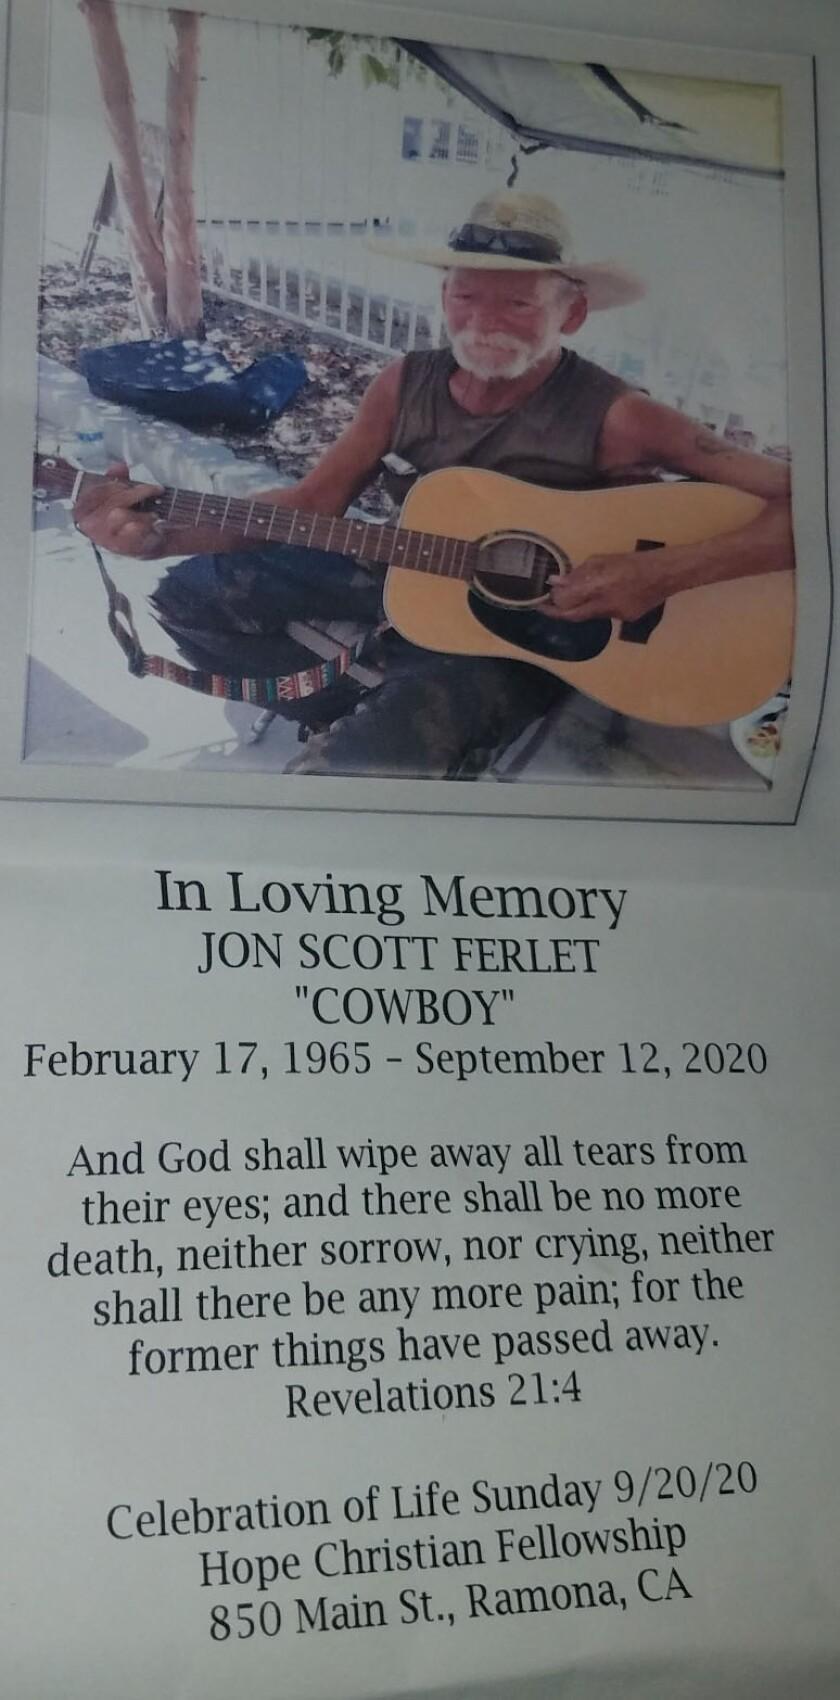 A Celebration of Life will be held for Jon Scott Ferlet at noon Sunday, Sept. 20, at Hope Christian Fellowship church.